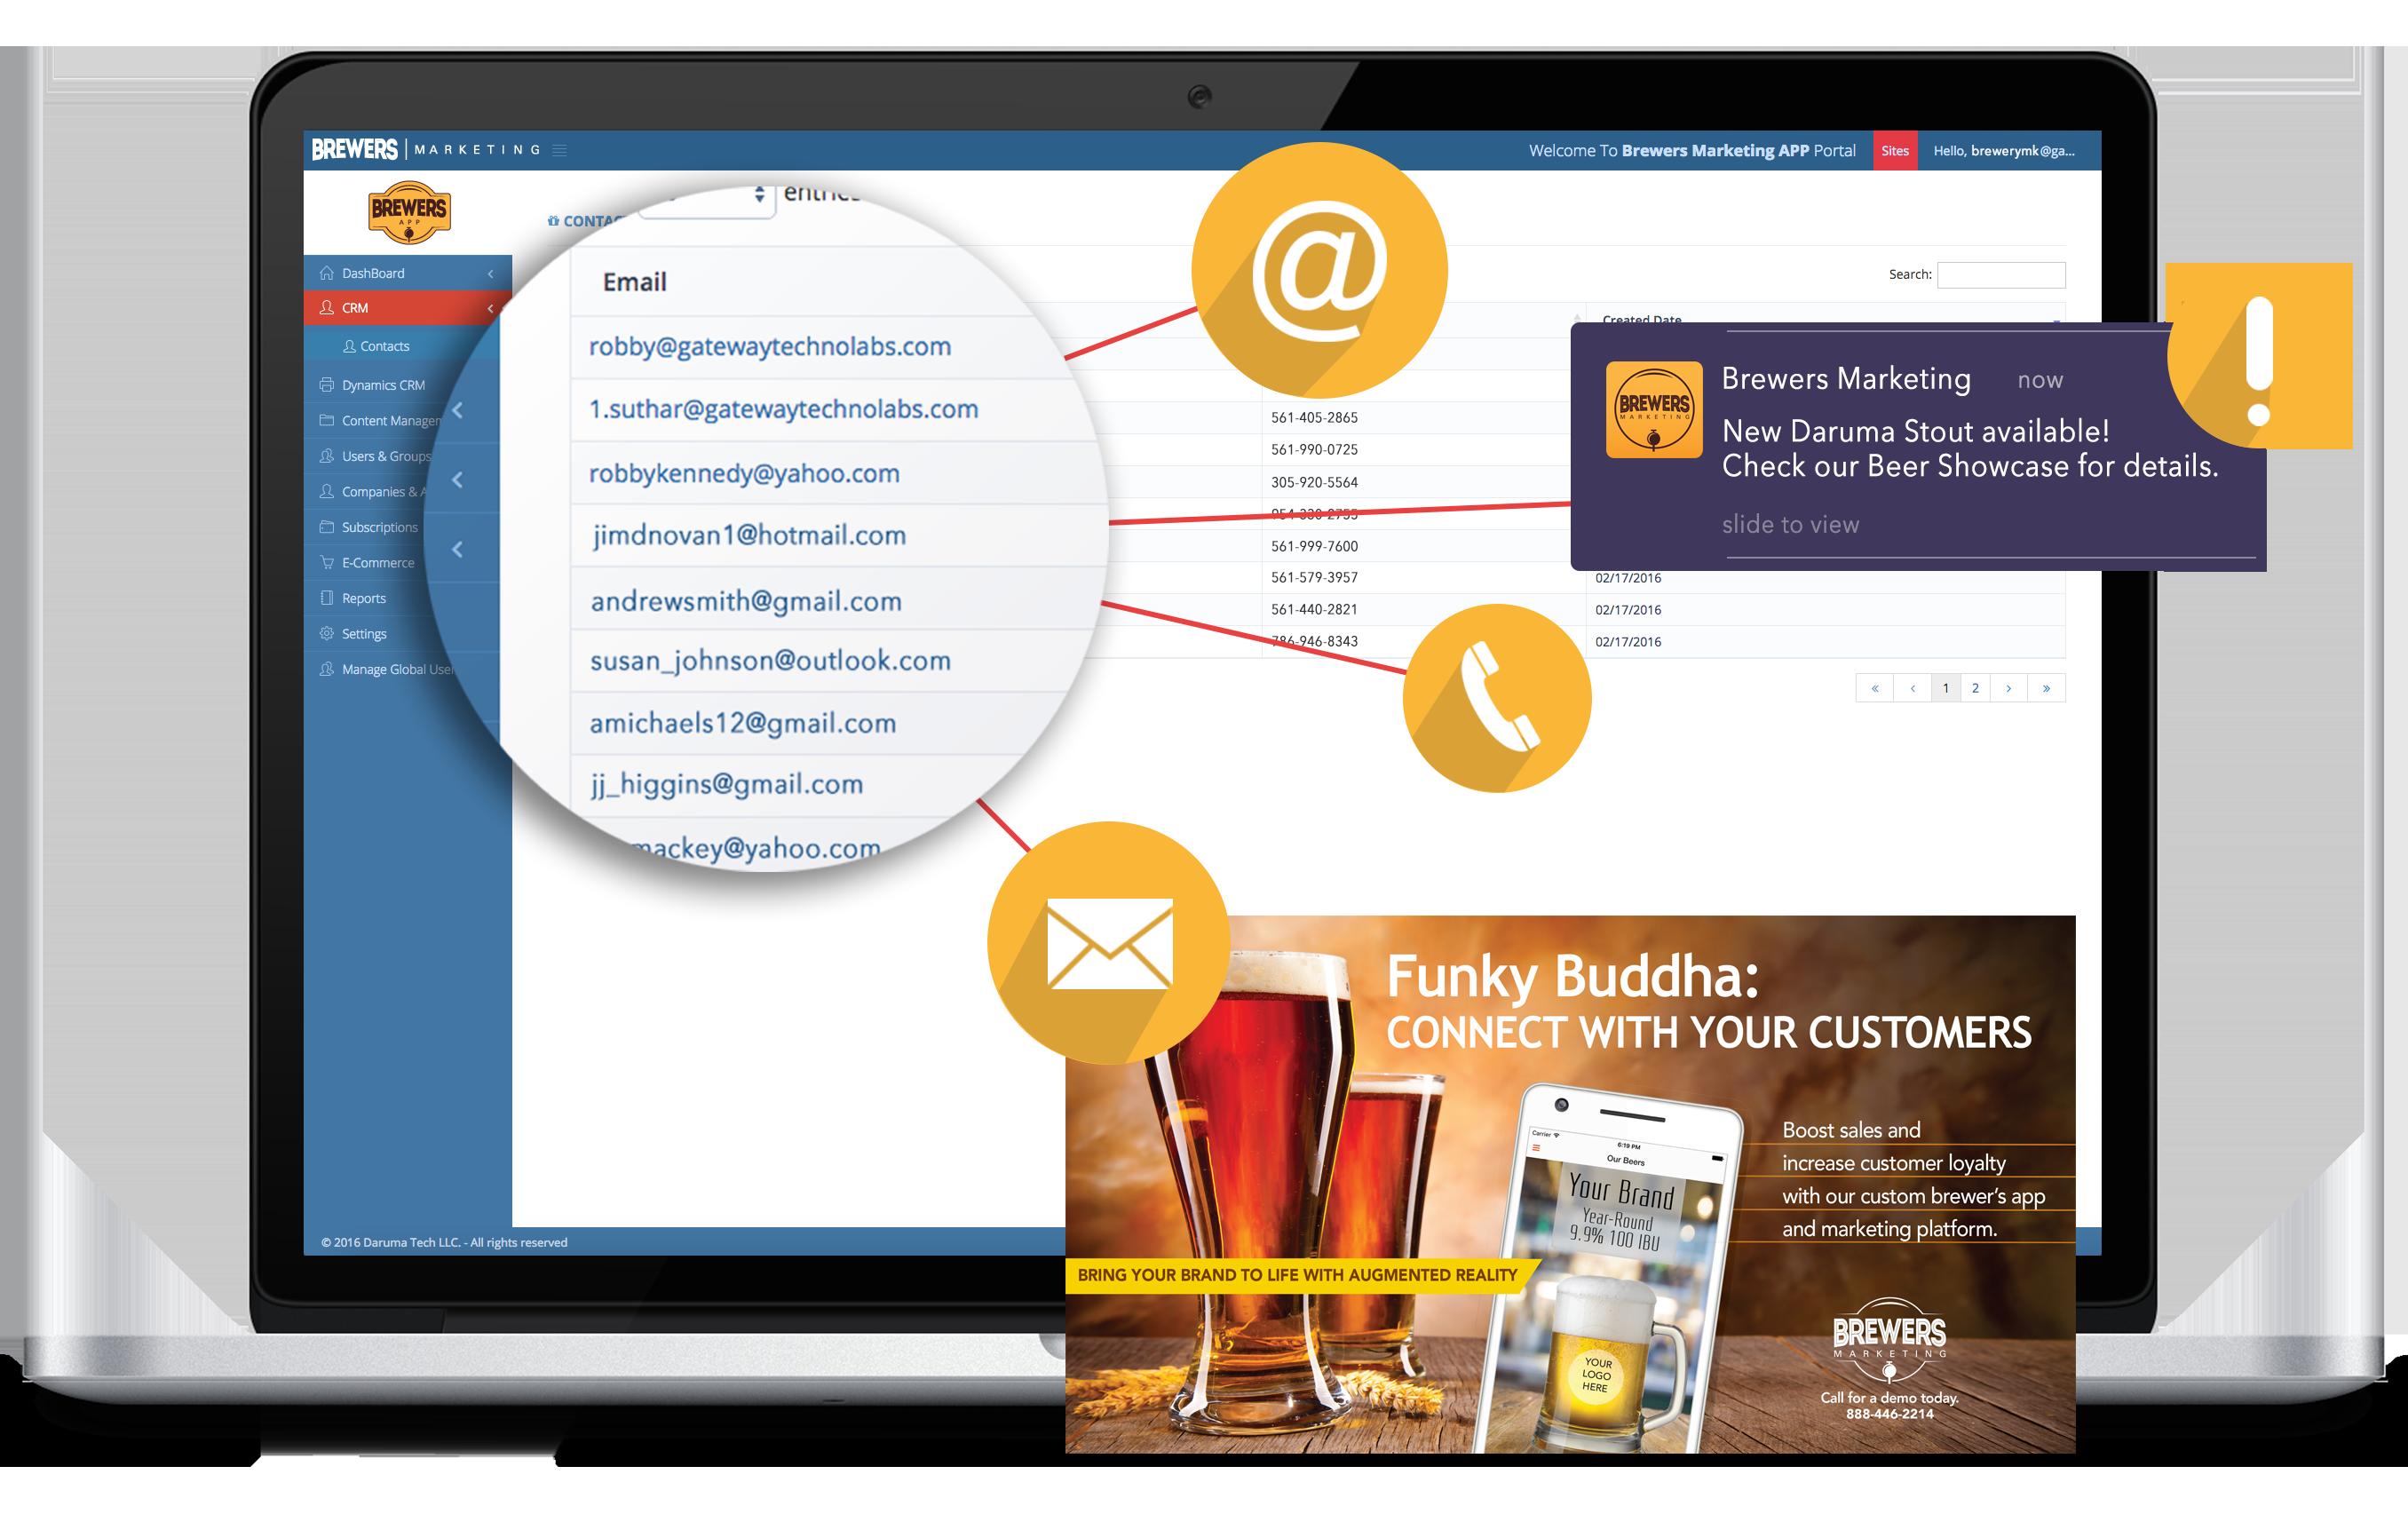 Brewers Marketing Customer Engagement screenshot